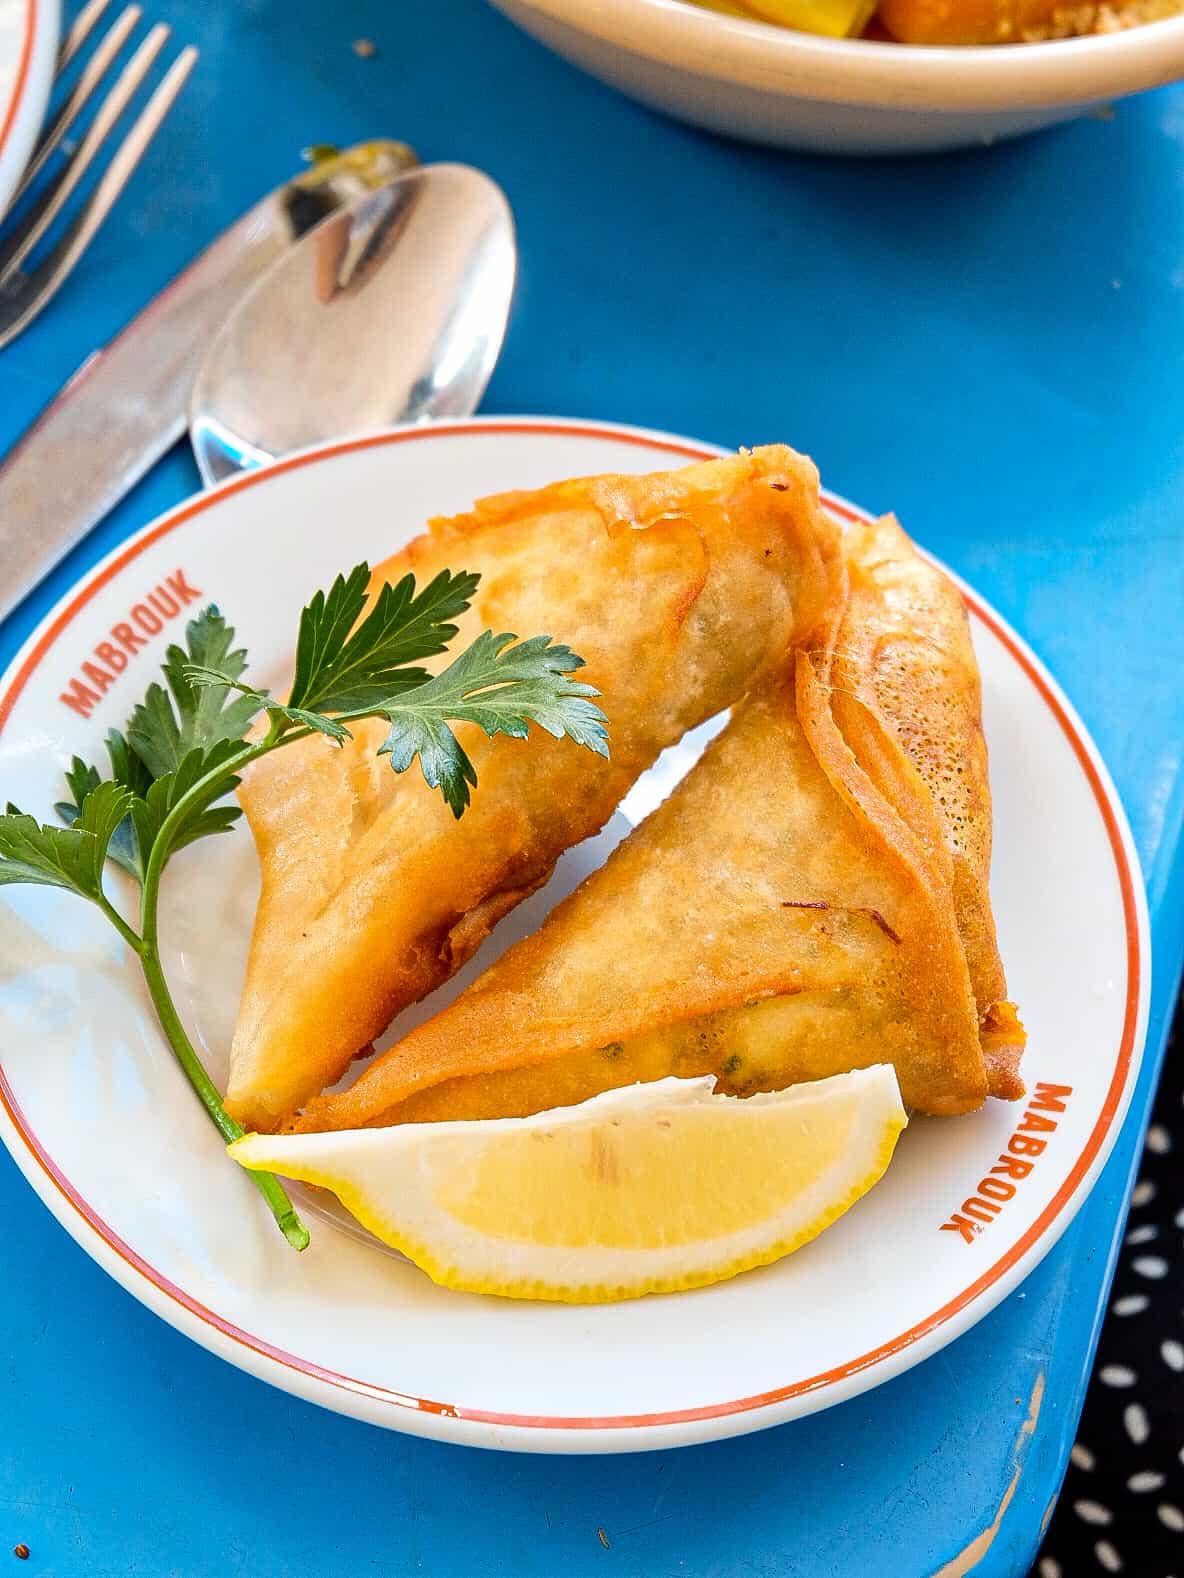 mabrouk-restaurant-tunisien-juif-paris-3-e